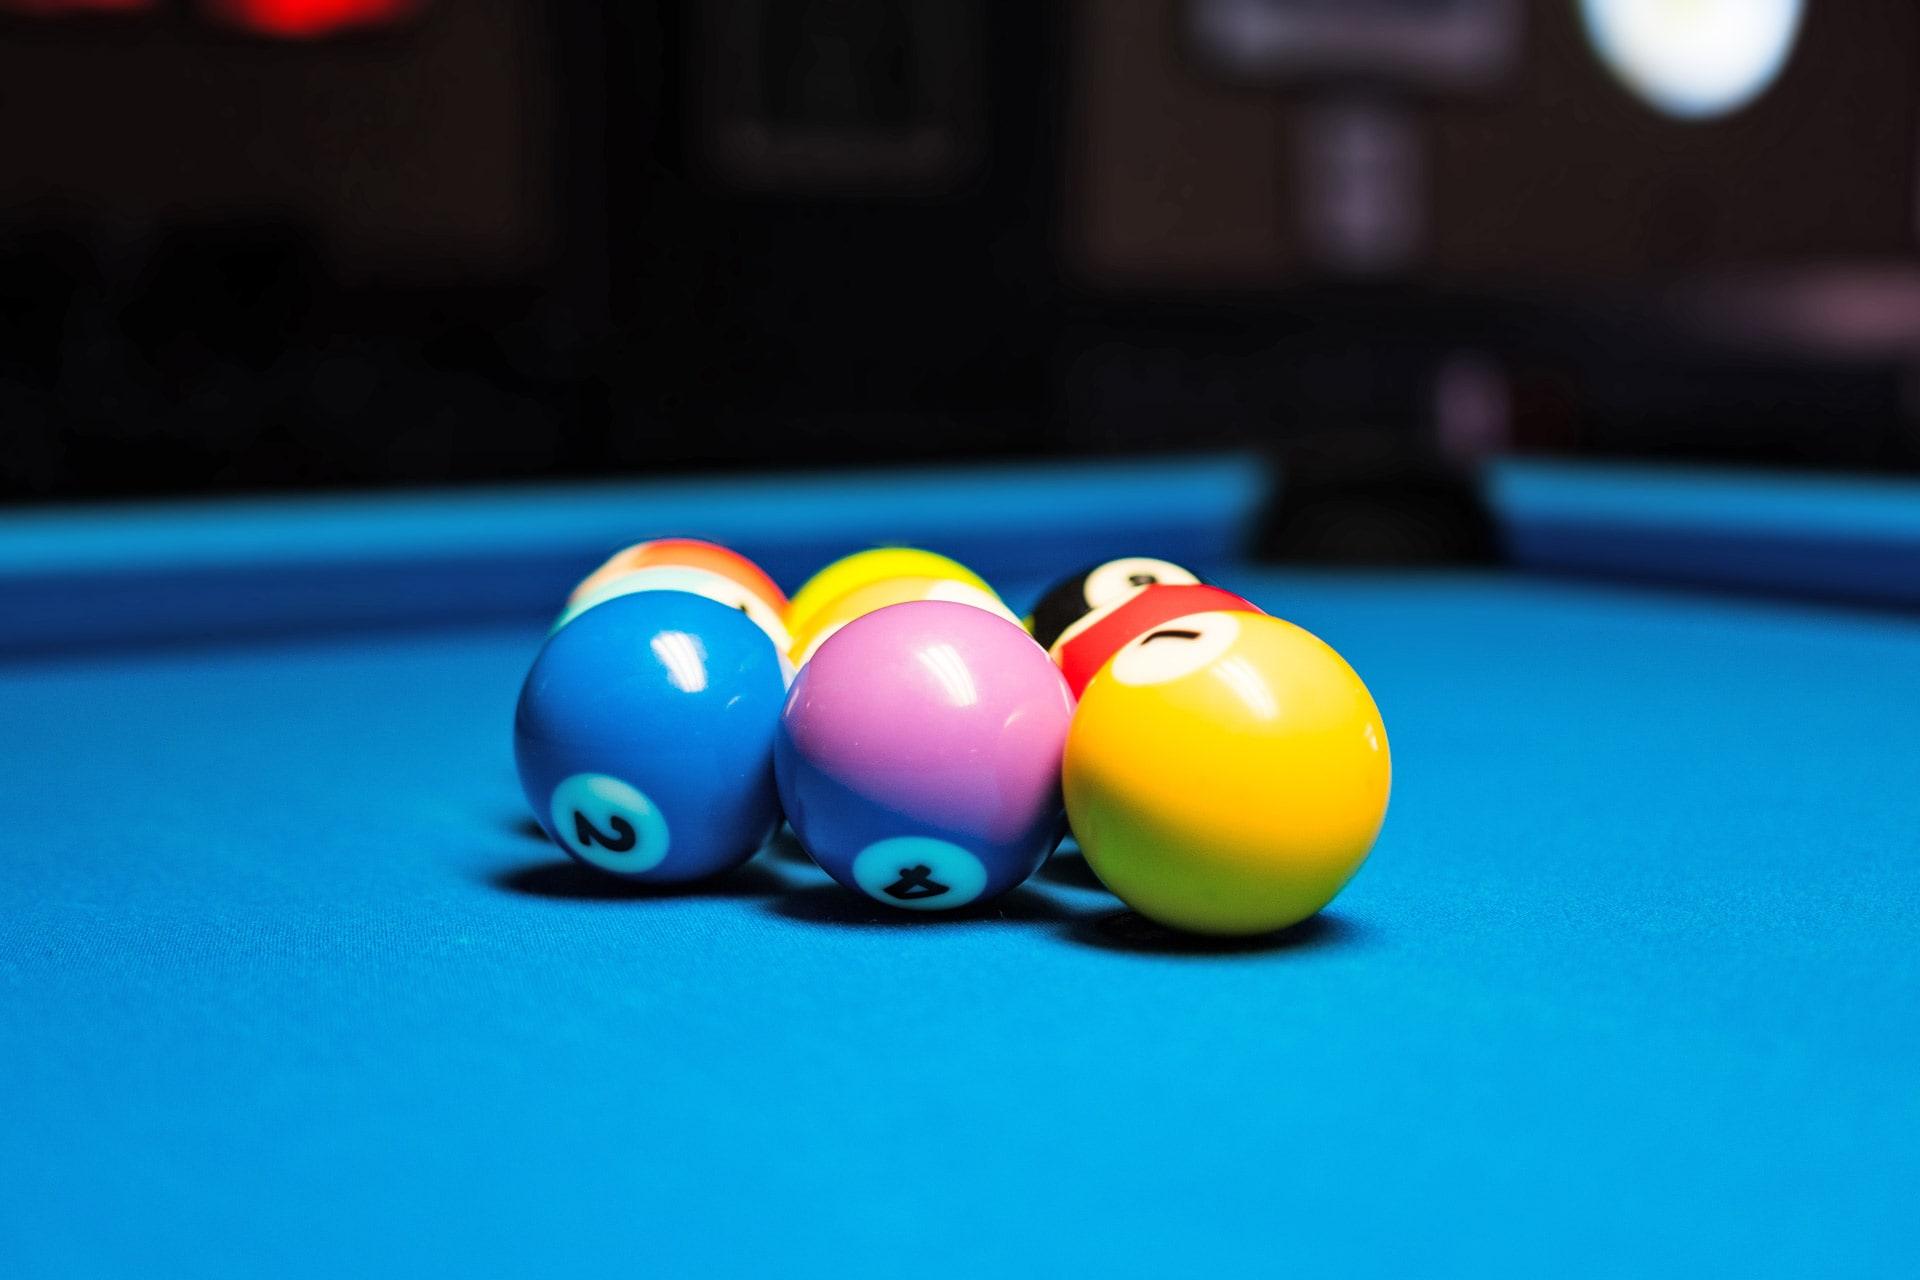 Birmingham Pool Halls - Poppa G's Billiards in Pelham, AL